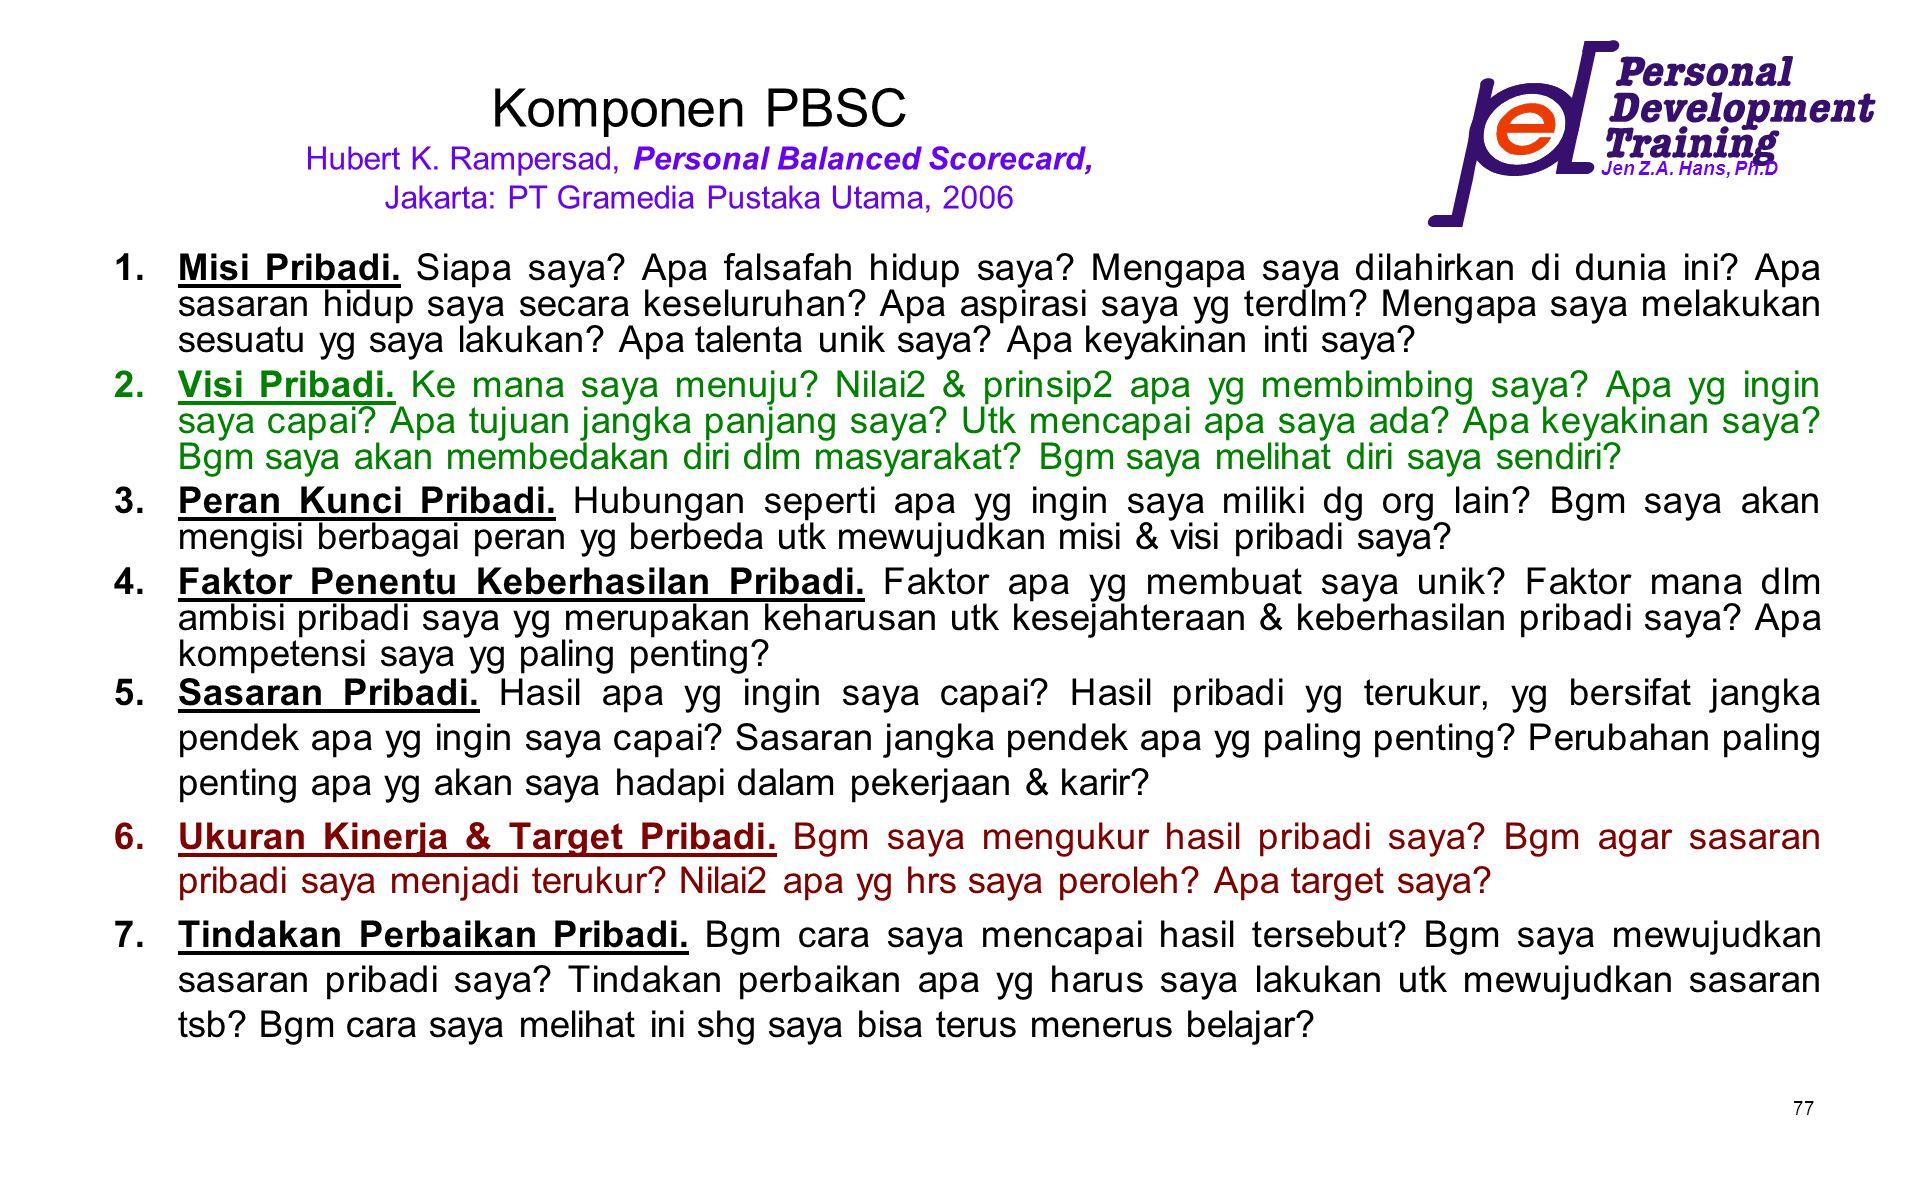 Jen Z.A. Hans, Ph.D 77 Komponen PBSC Hubert K. Rampersad, Personal Balanced Scorecard, Jakarta: PT Gramedia Pustaka Utama, 2006 1.Misi Pribadi. Siapa